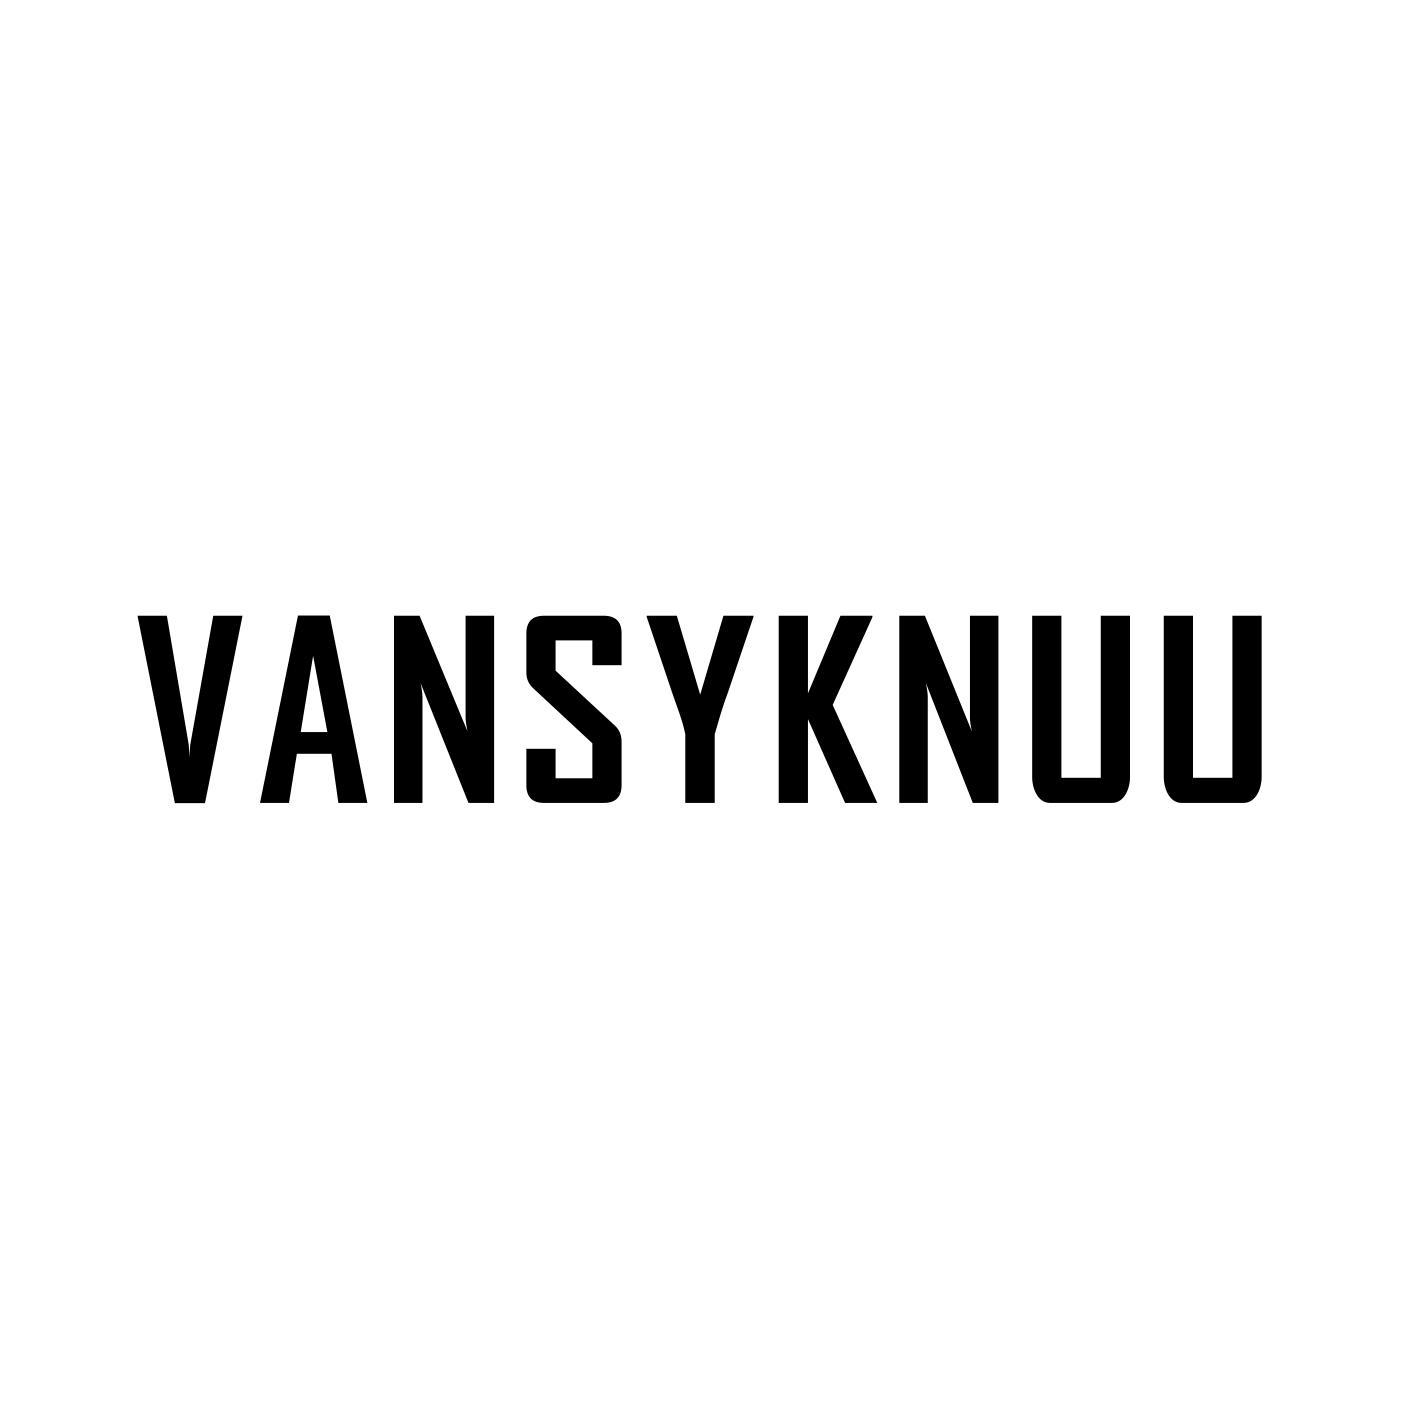 VANSYKNUU